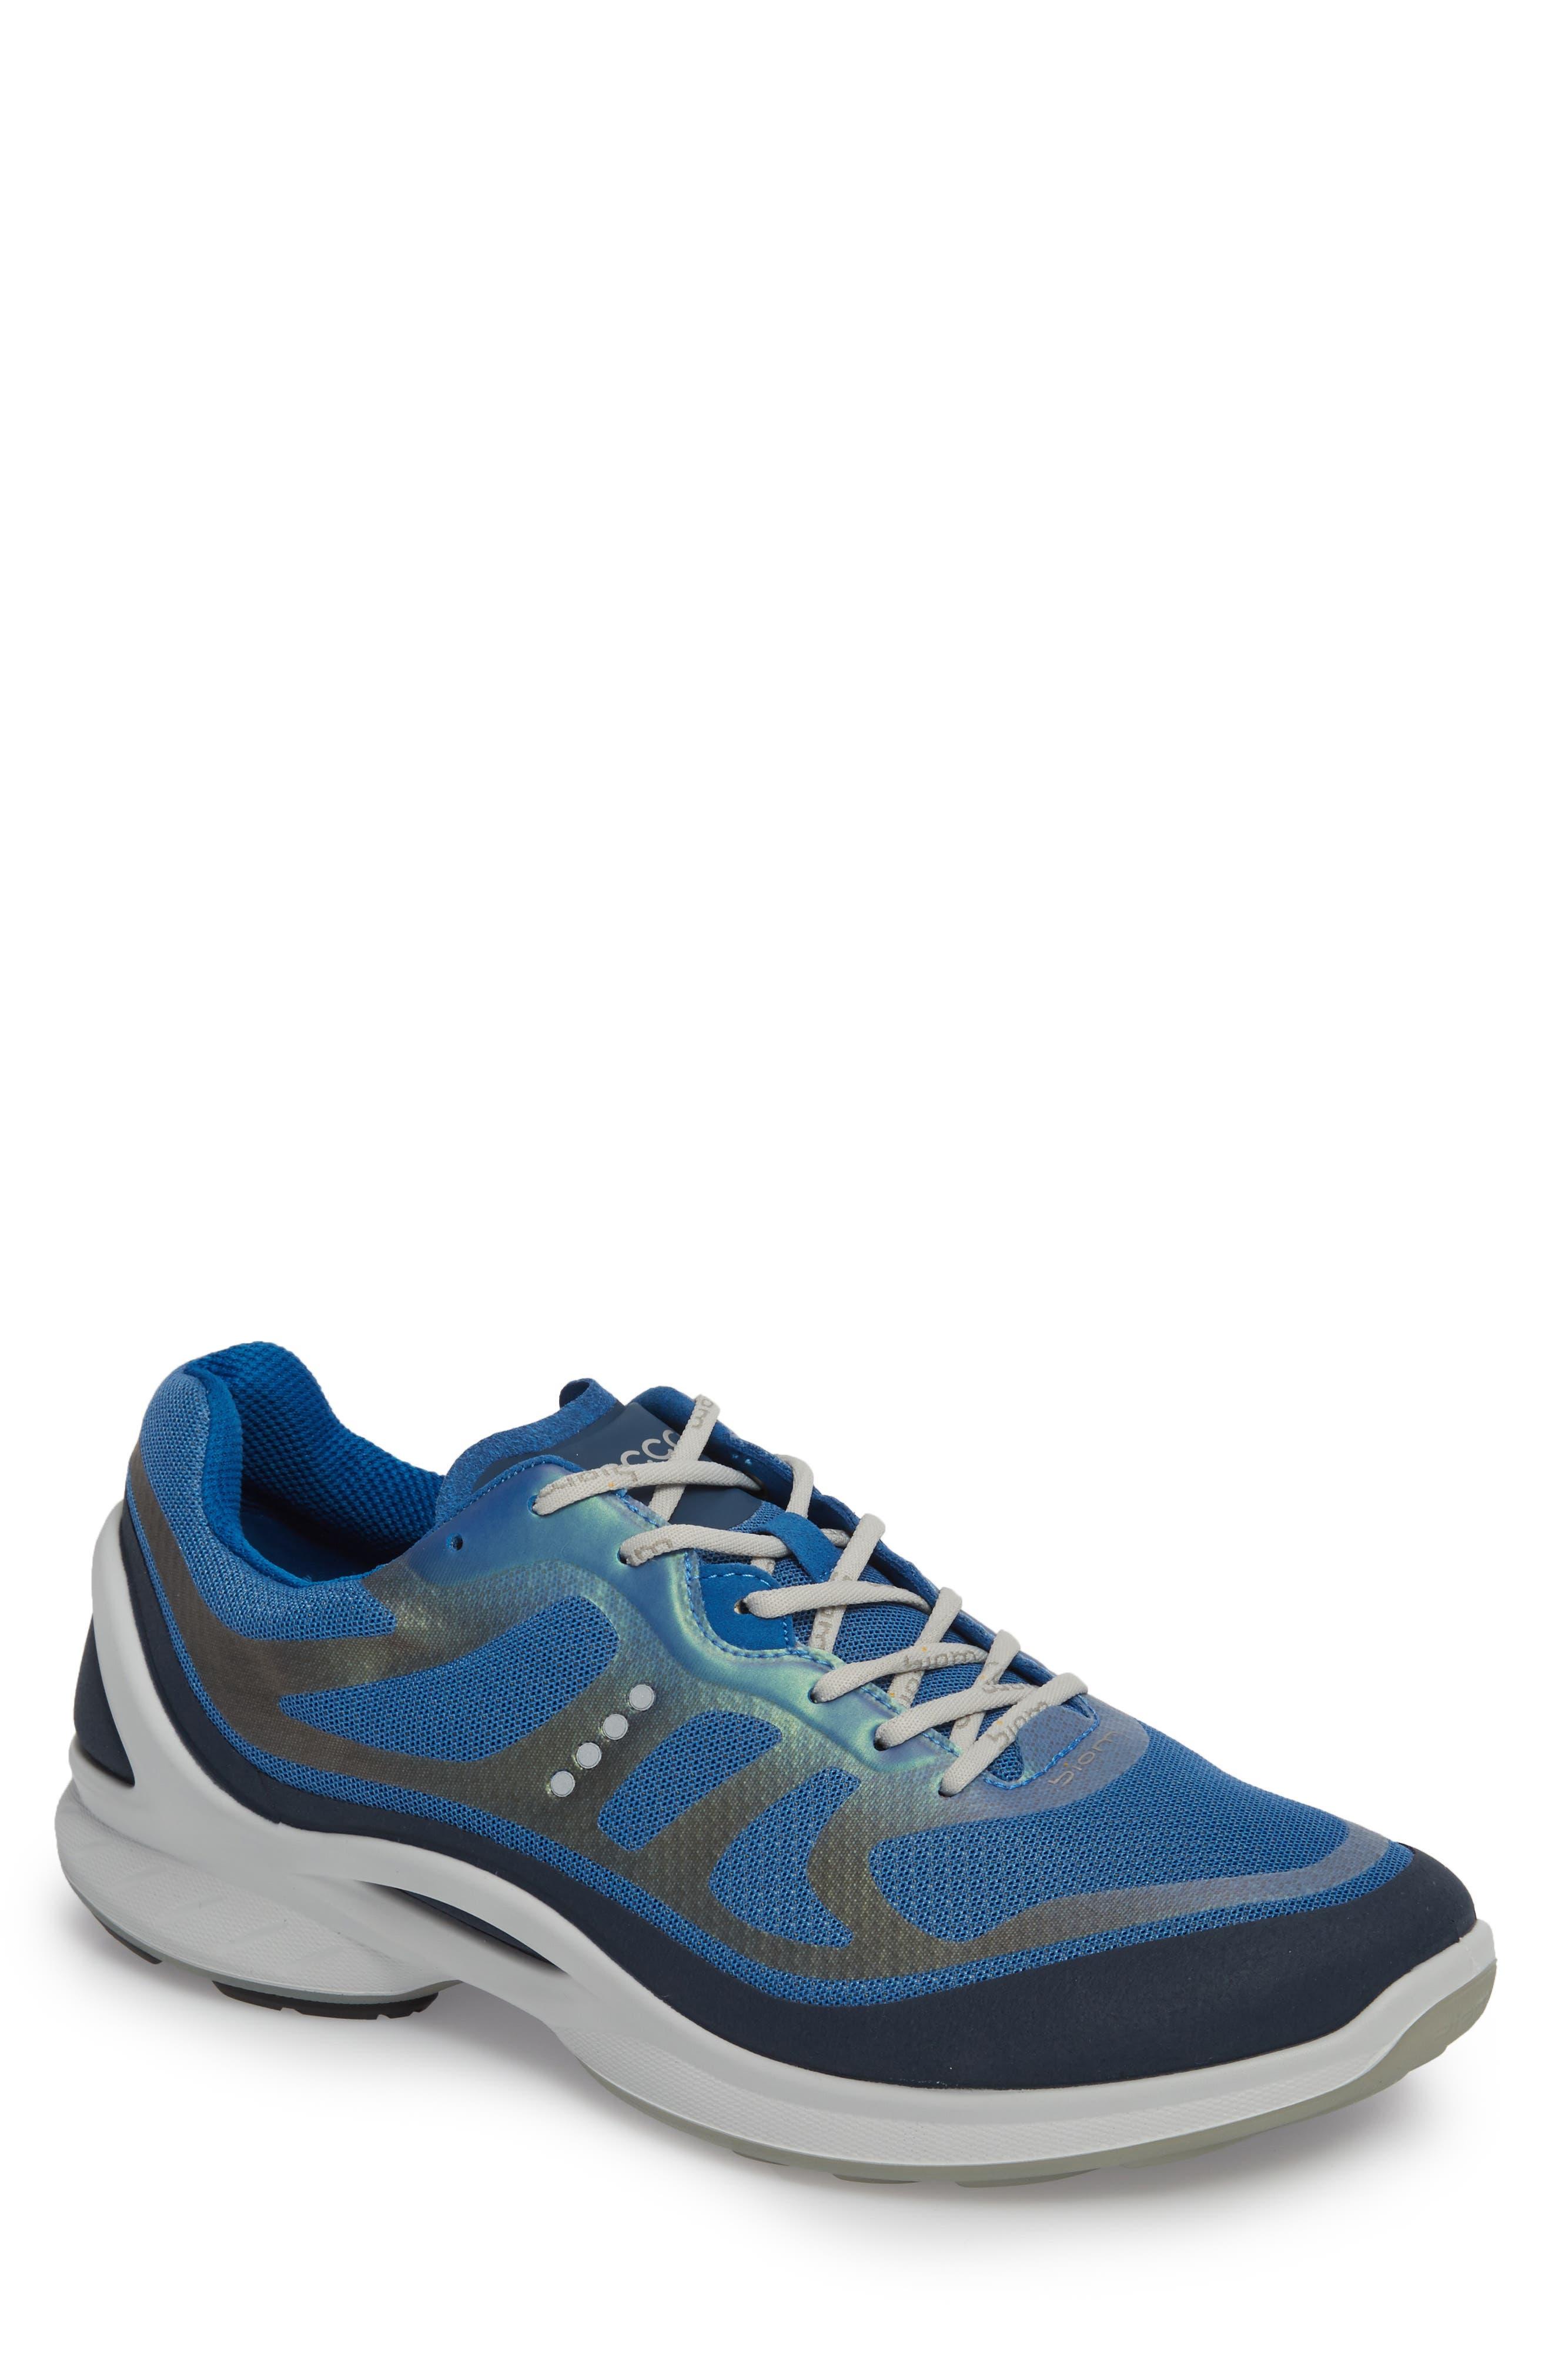 BIOM Fjuel Tie Sneaker,                             Main thumbnail 1, color,                             MARINE/ BLUE TEXTILE